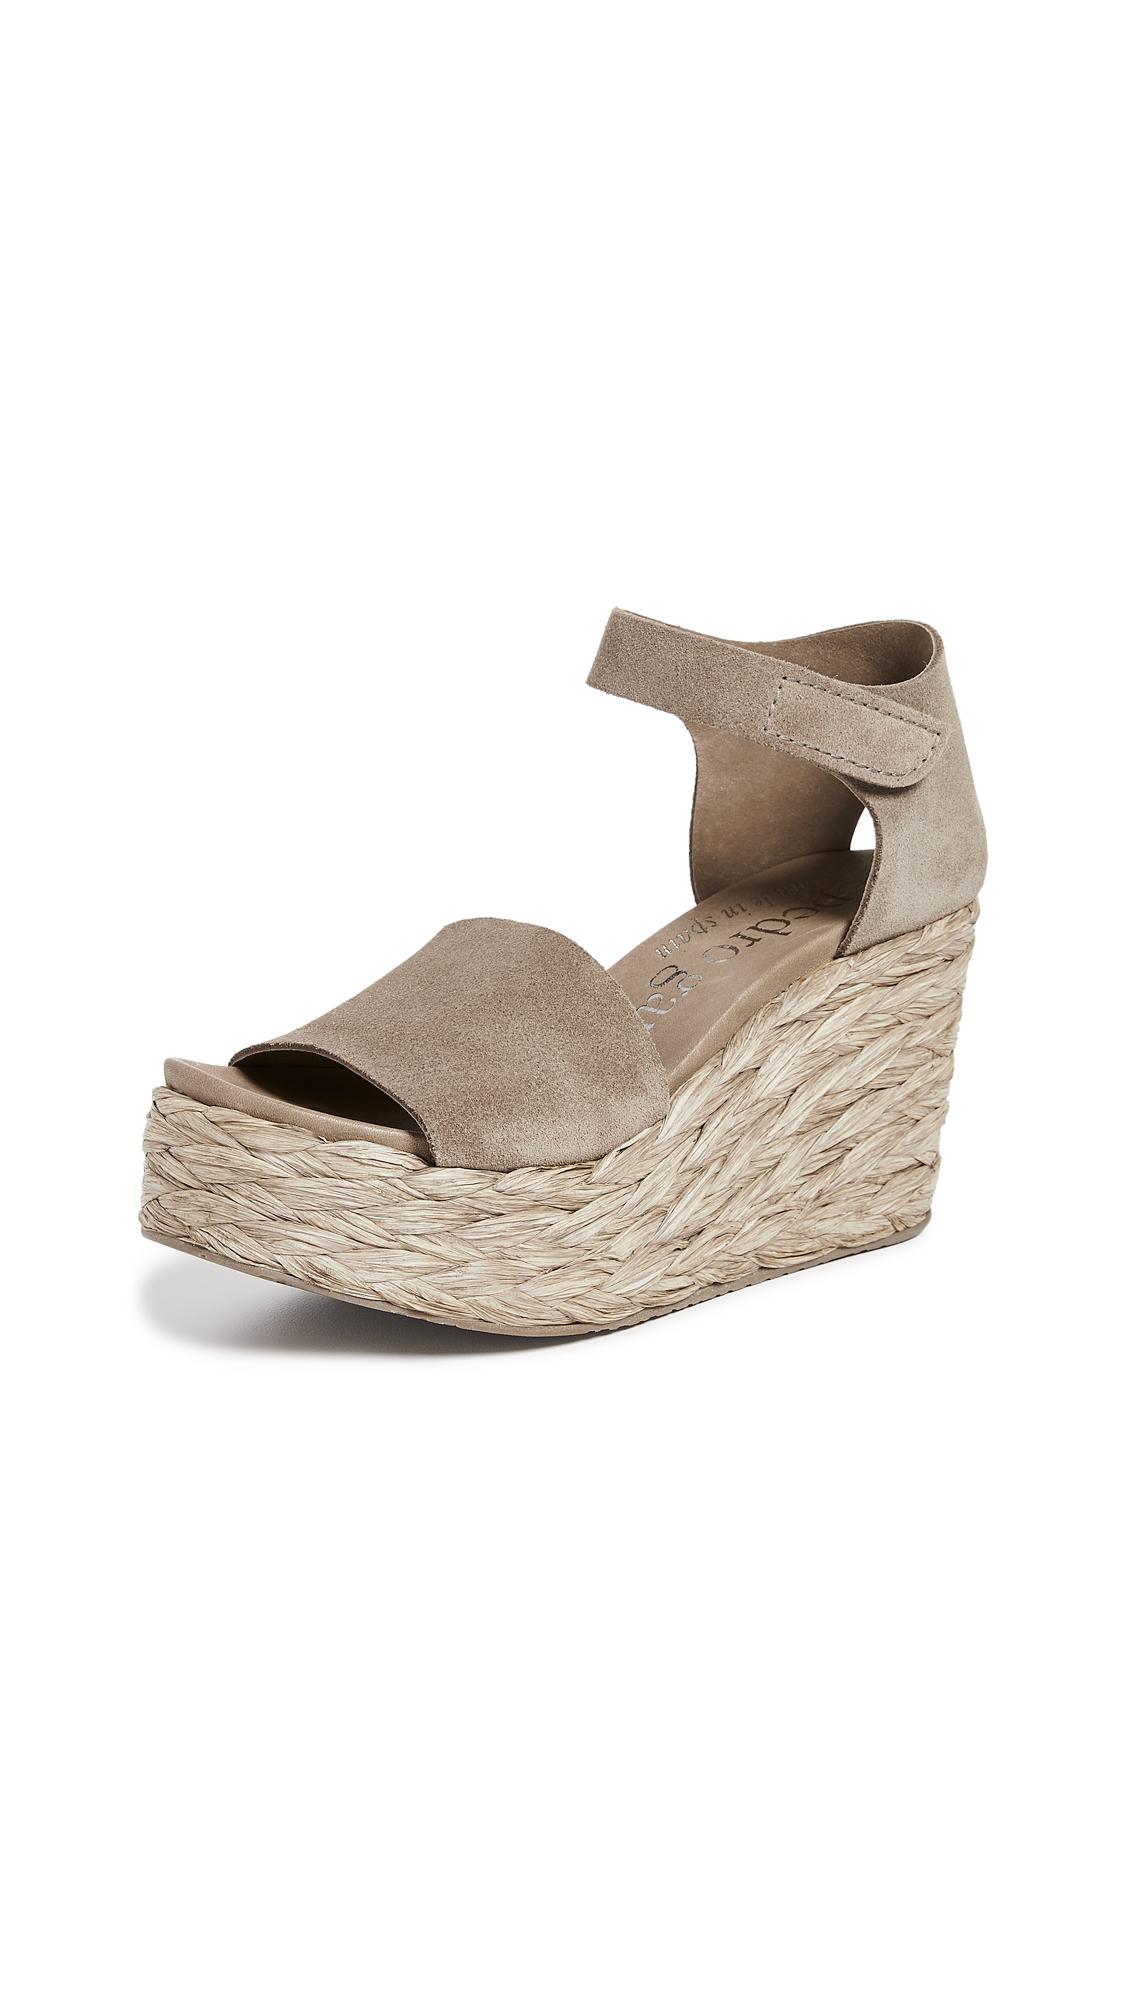 Pedro Garcia Dory Wedge Sandals - Bark